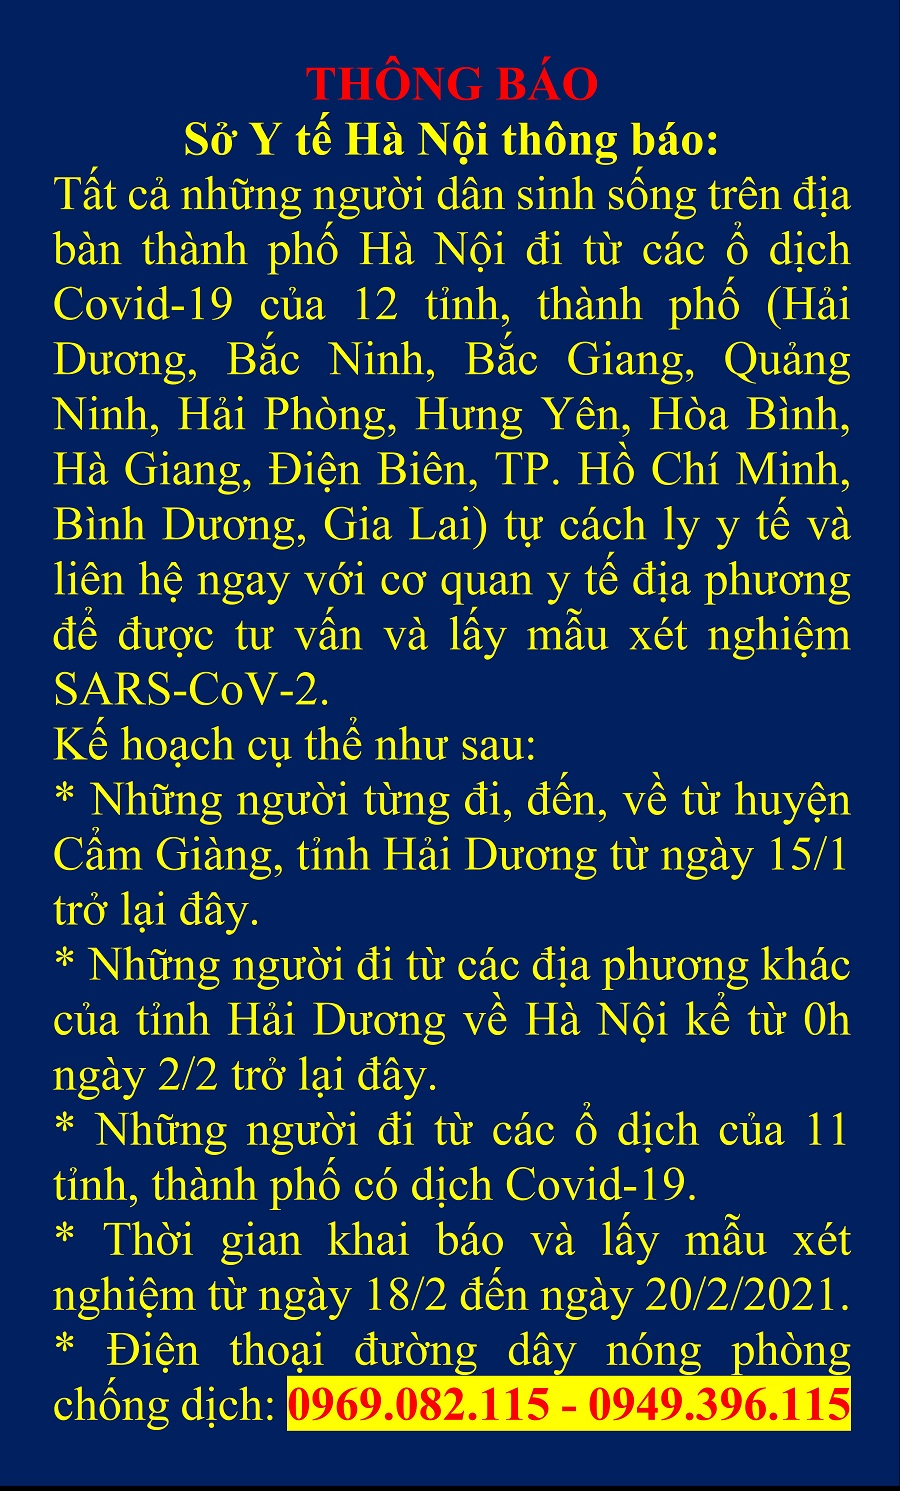 ha_noi_xet_nghiem_sars_cov_2_cho-1613644134597.jpg